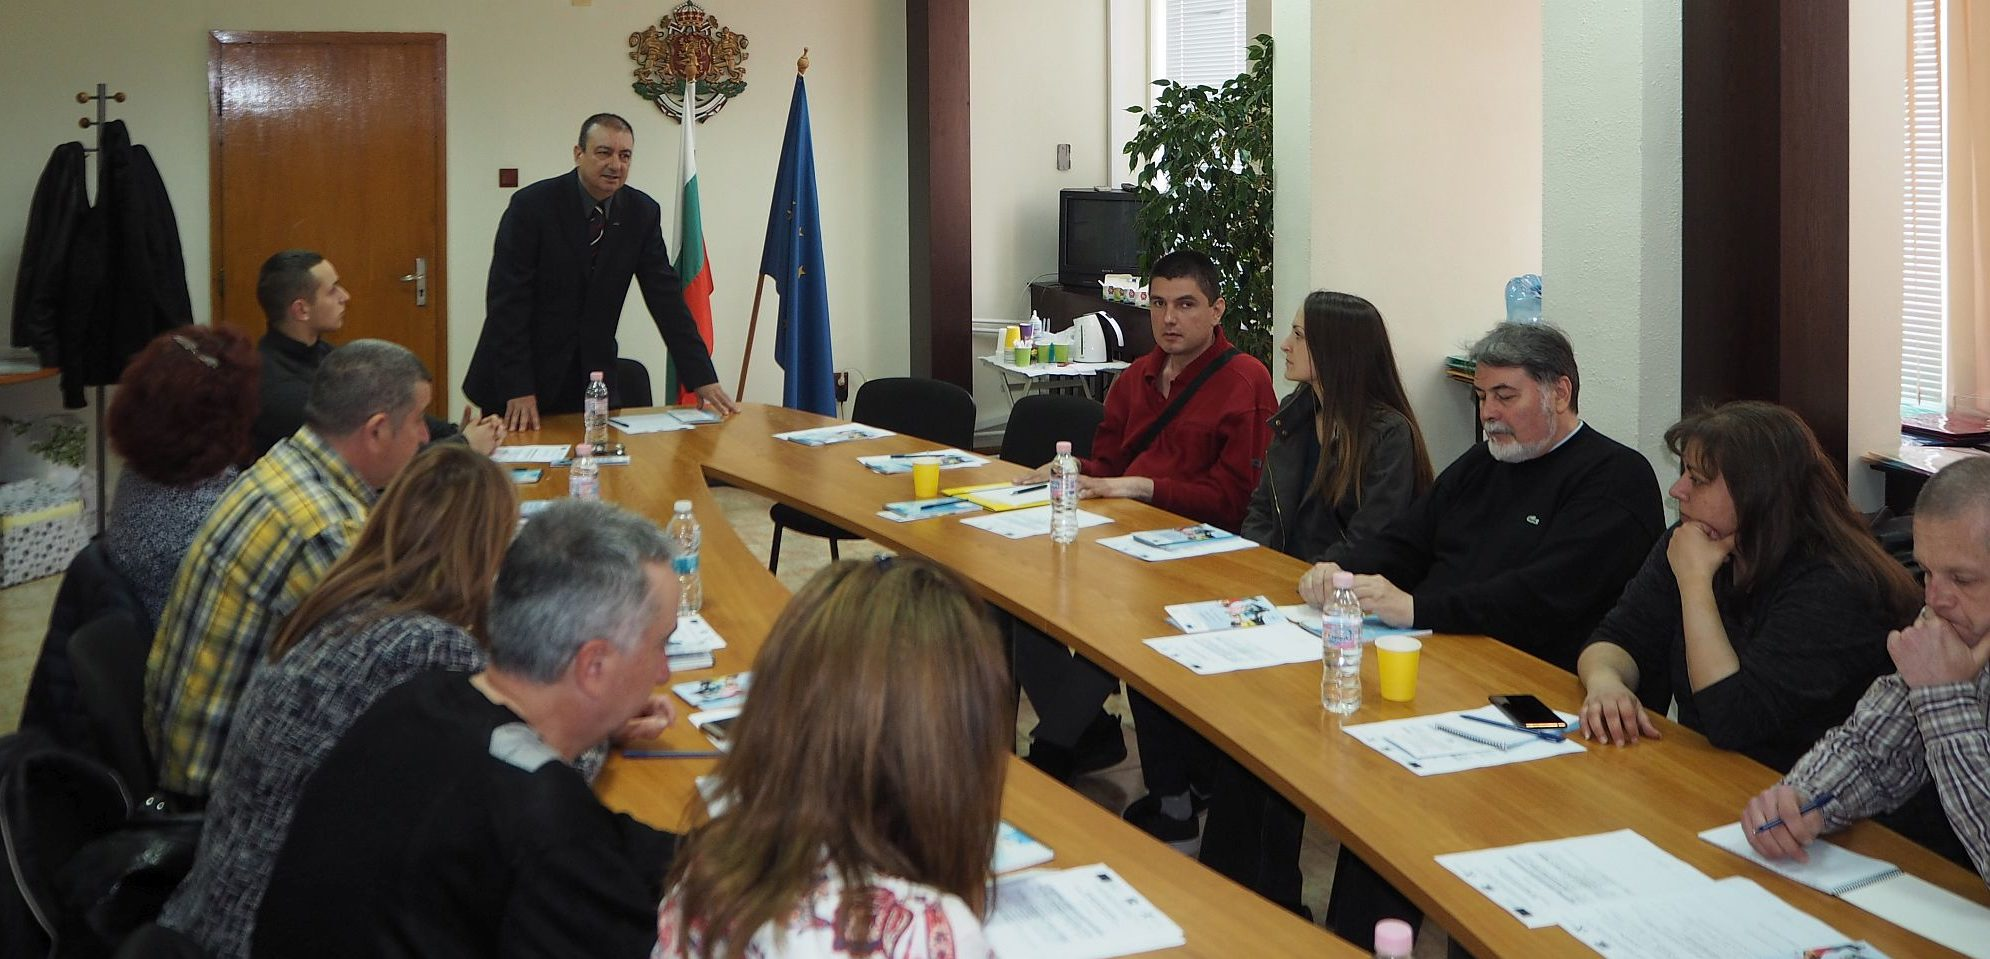 Информационна и работна среща по младежки политики ге� ...